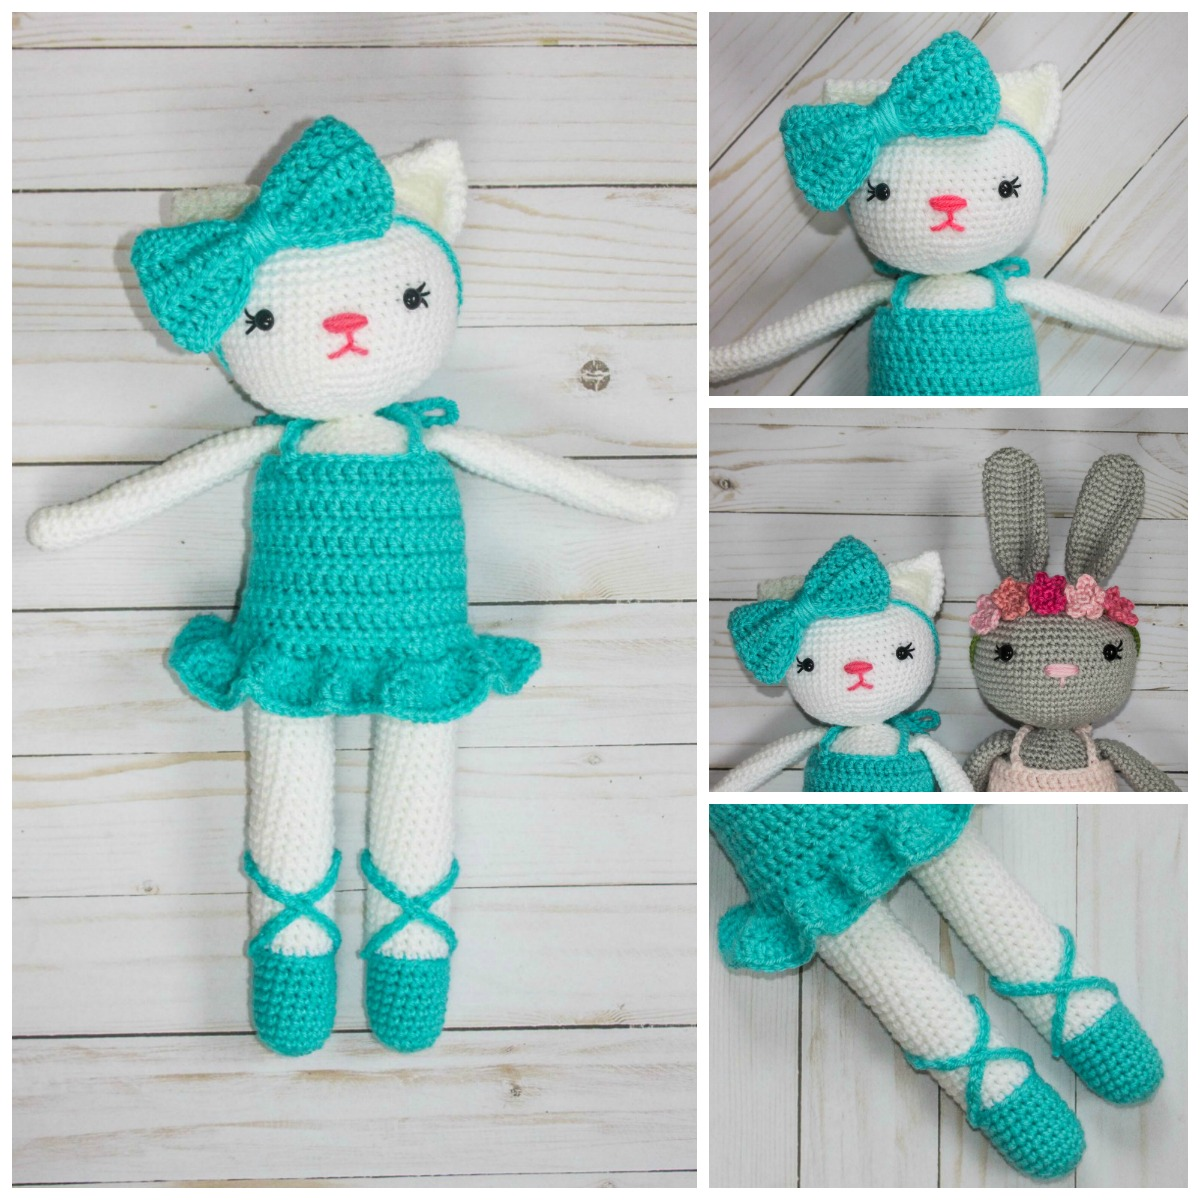 Ballerina Kitty Crochet Pattern - thefriendlyredfox.com